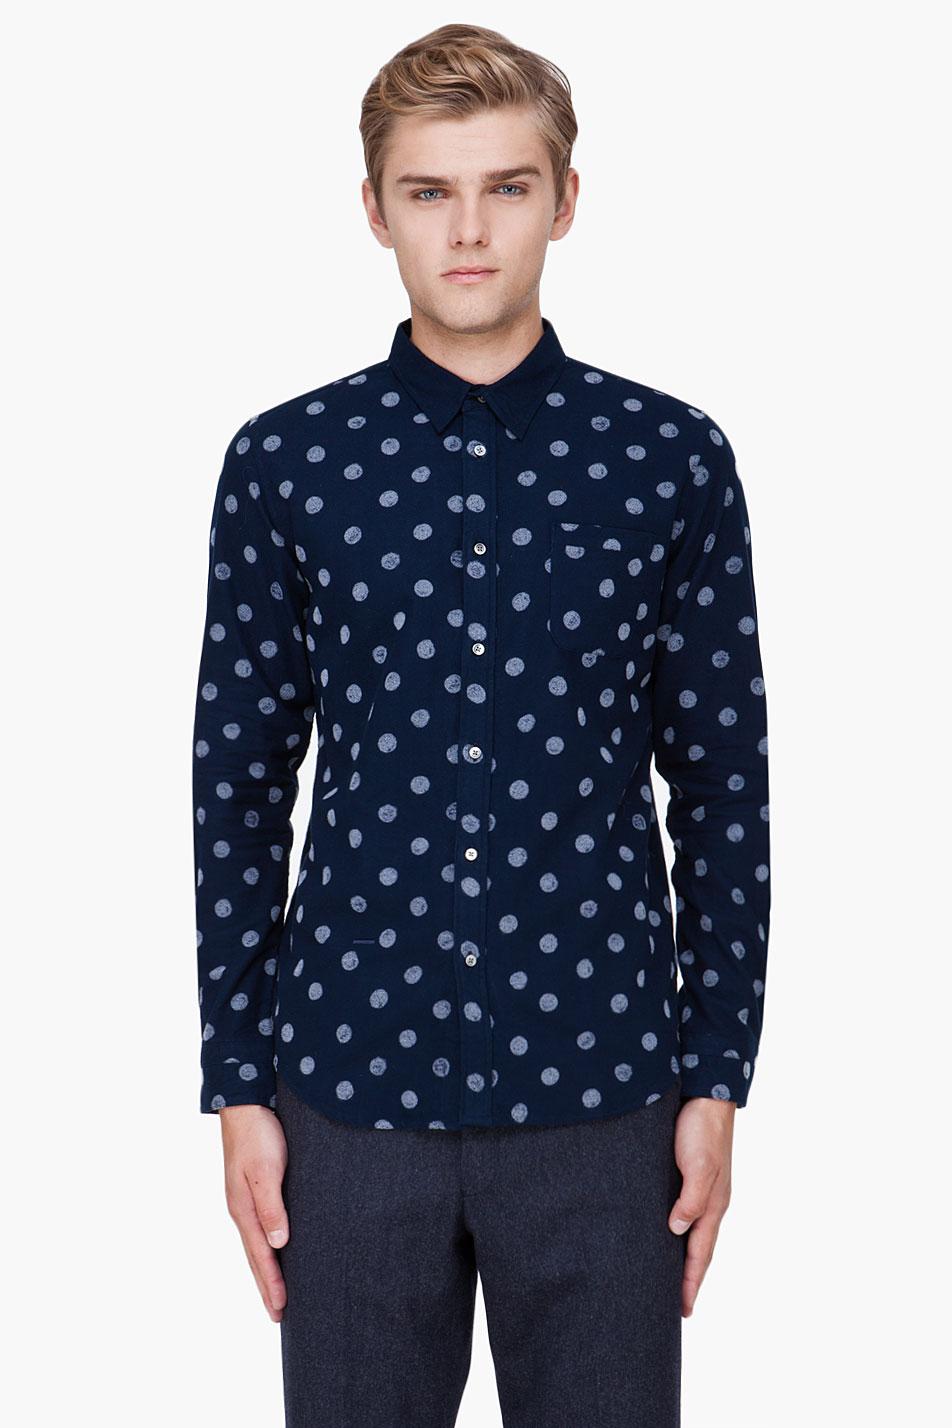 Robert geller navy polka dot print shirt in blue for men for Dotted shirts for mens